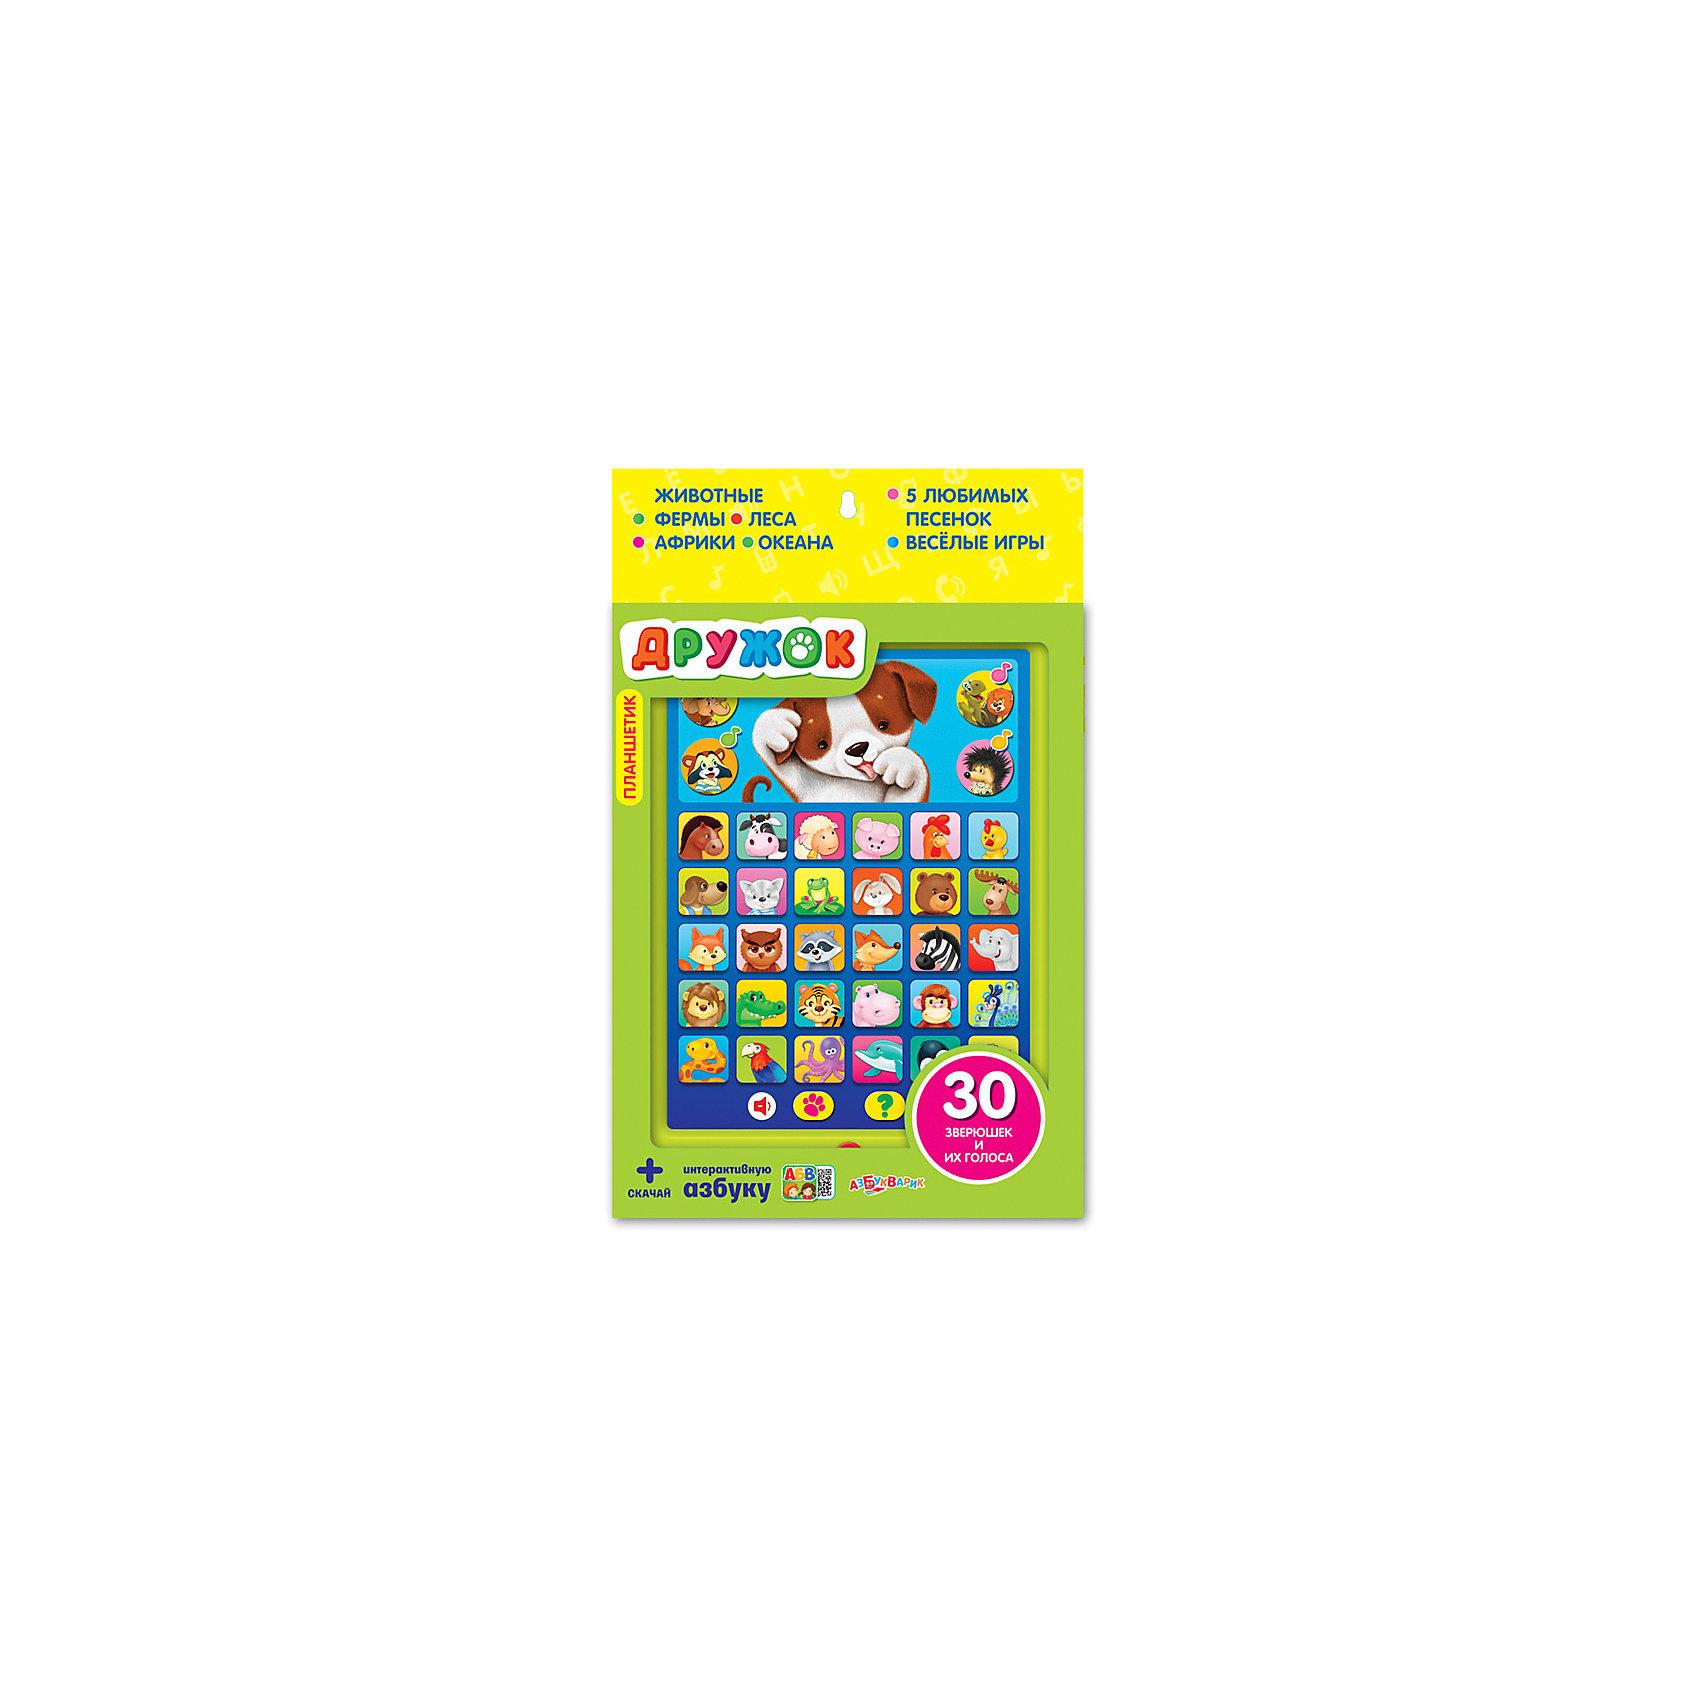 Азбукварик Книга-планшет Дружок планшет азбукварик планшет мультяшки повторяшки 4680019280158